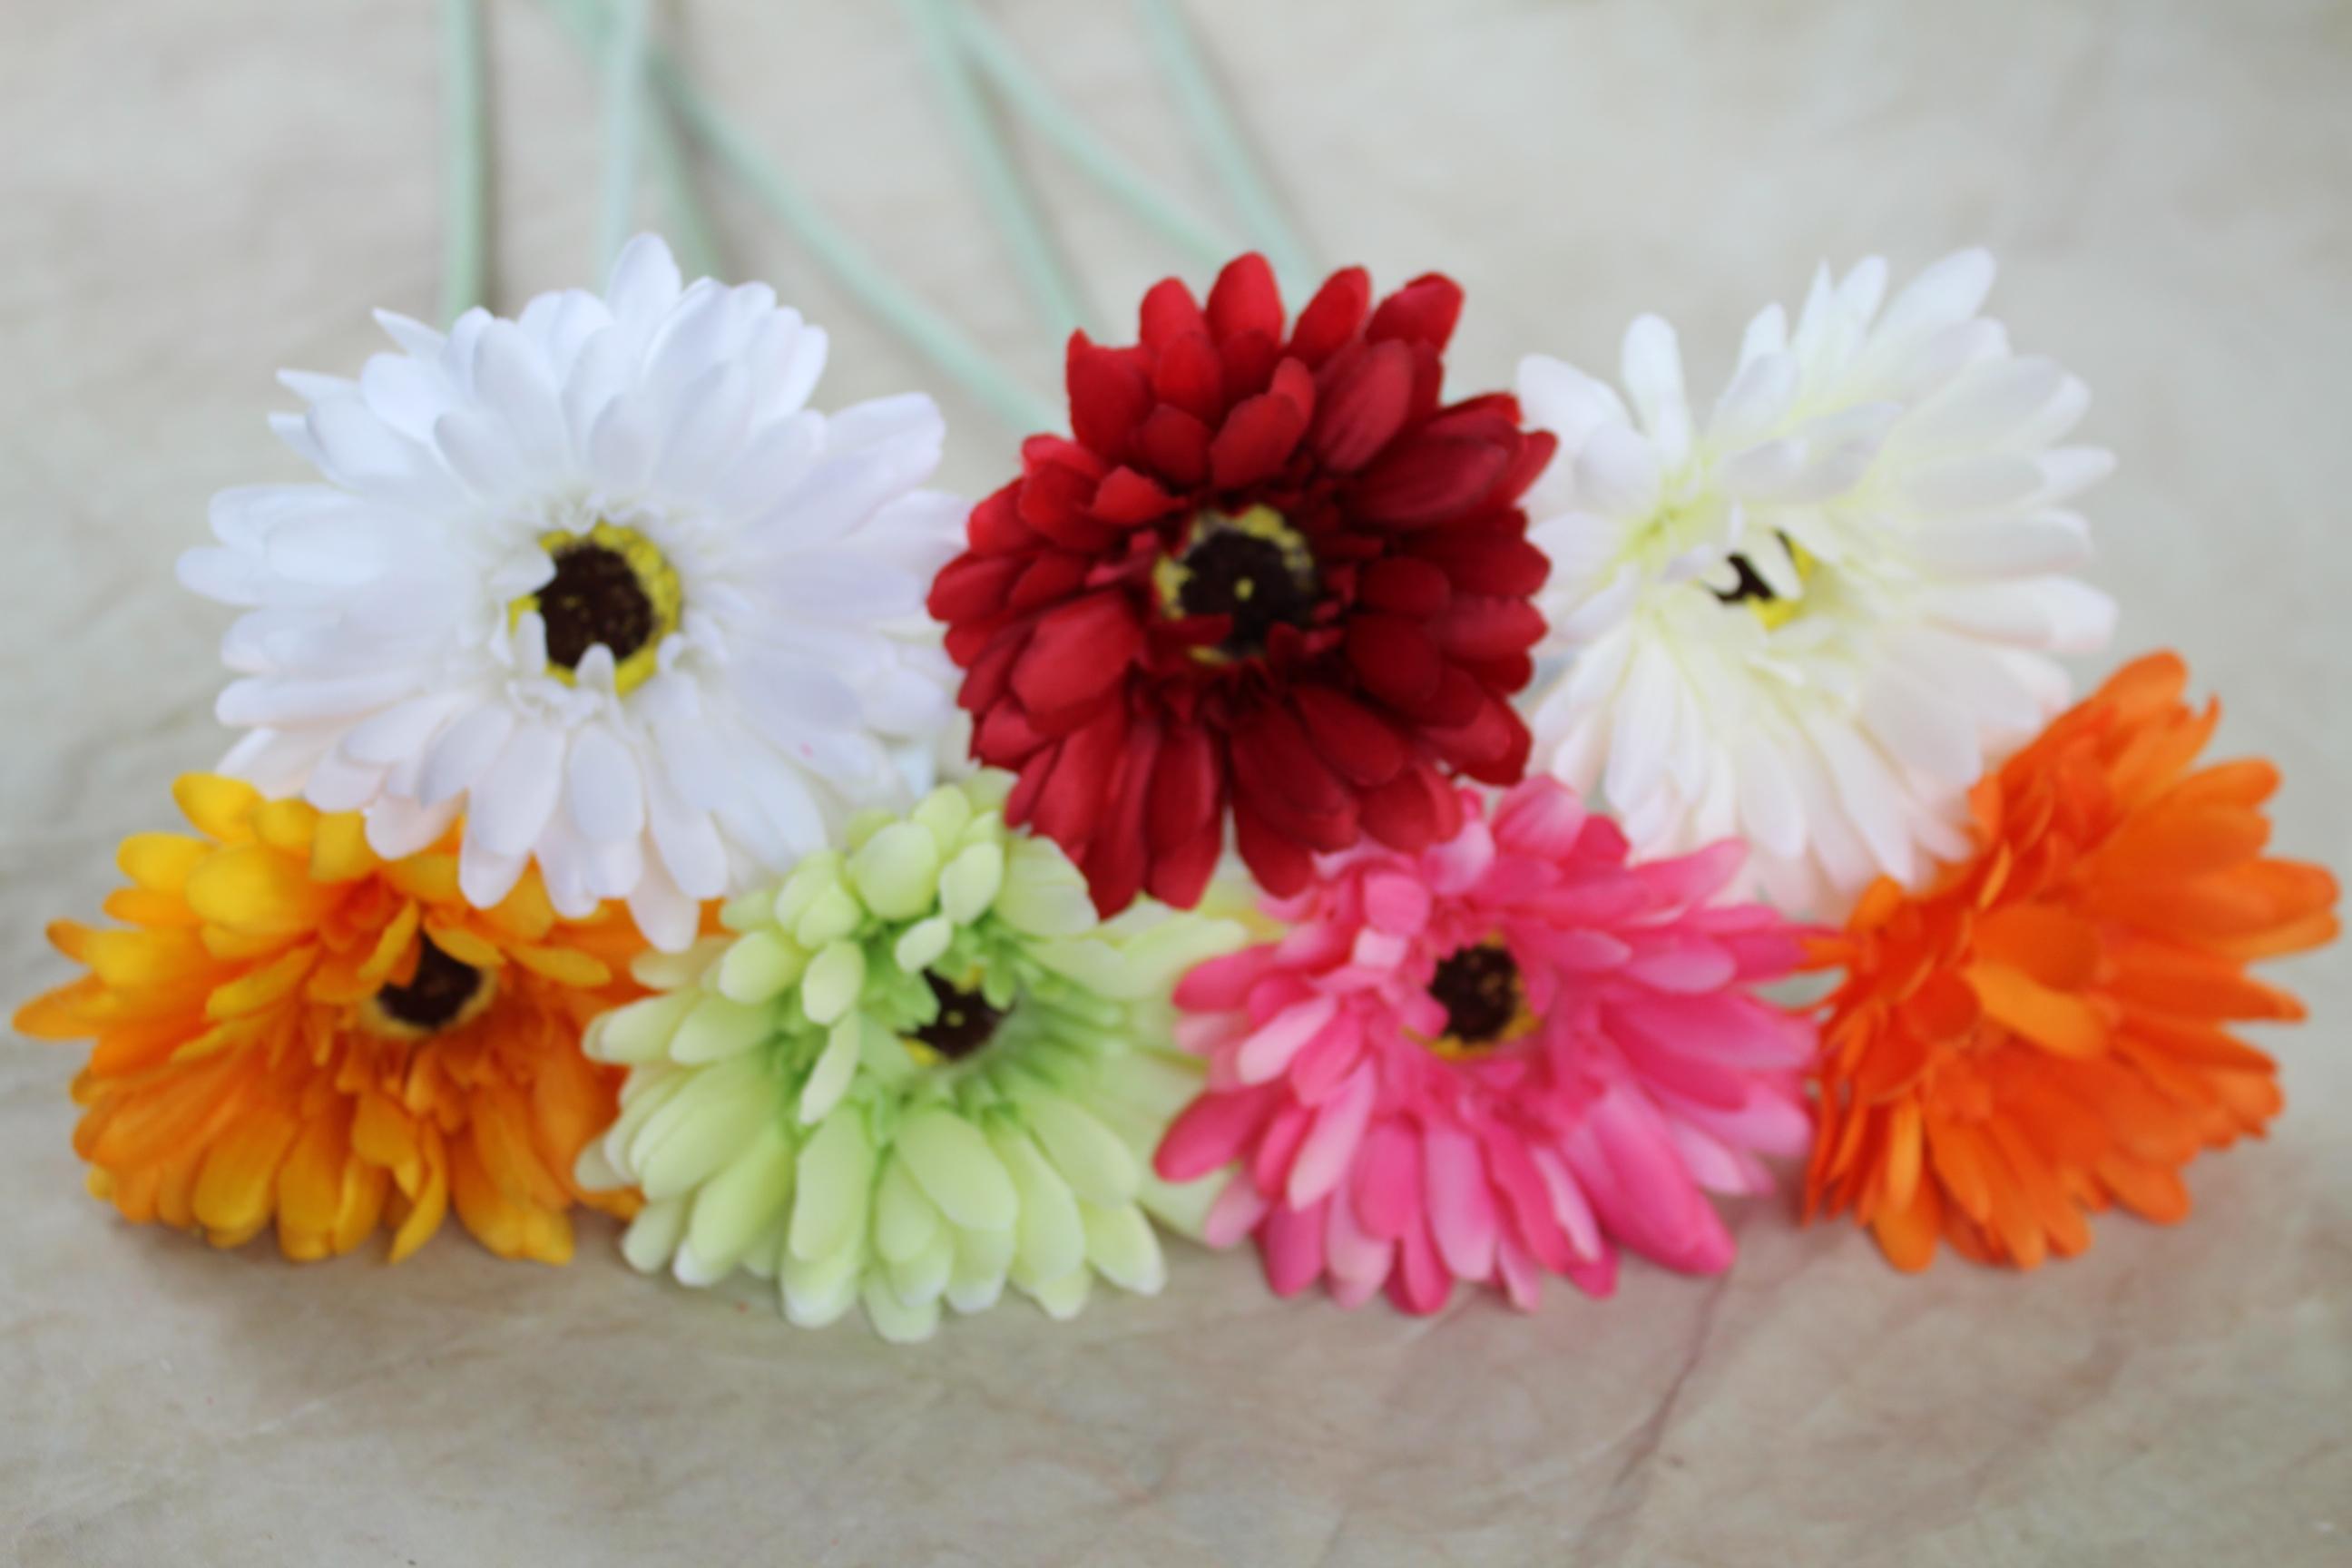 36 x 9cm Gerbera daisy on 48cm stem